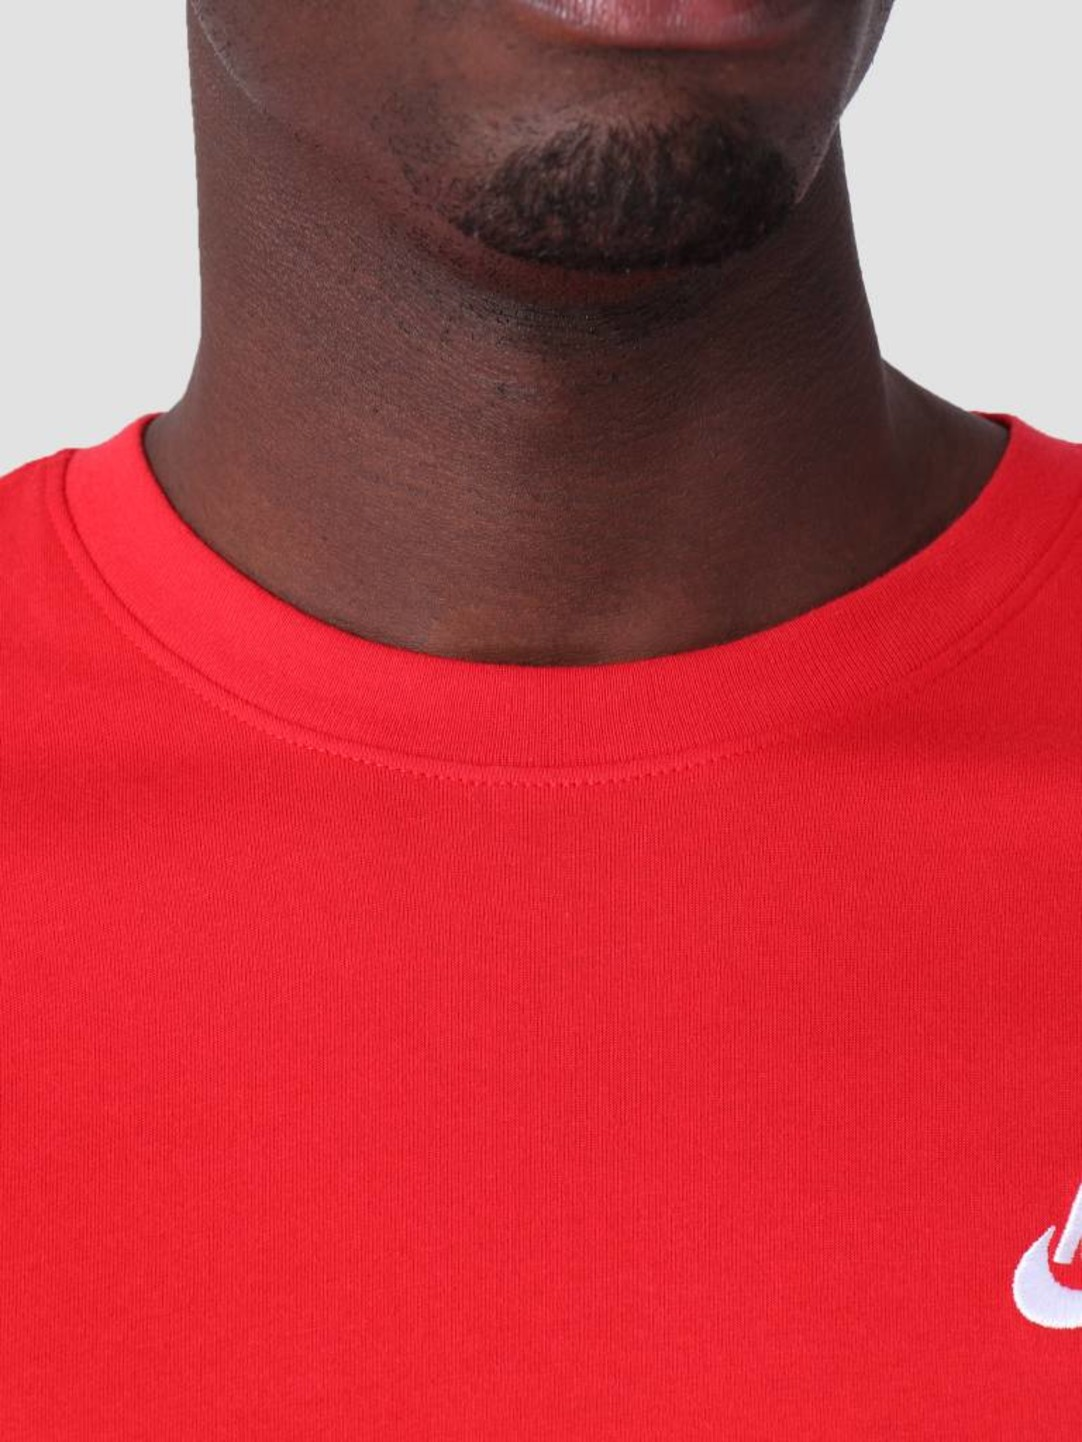 Nike Nike Sportswear T-Shirt University Red White Ar4997-657